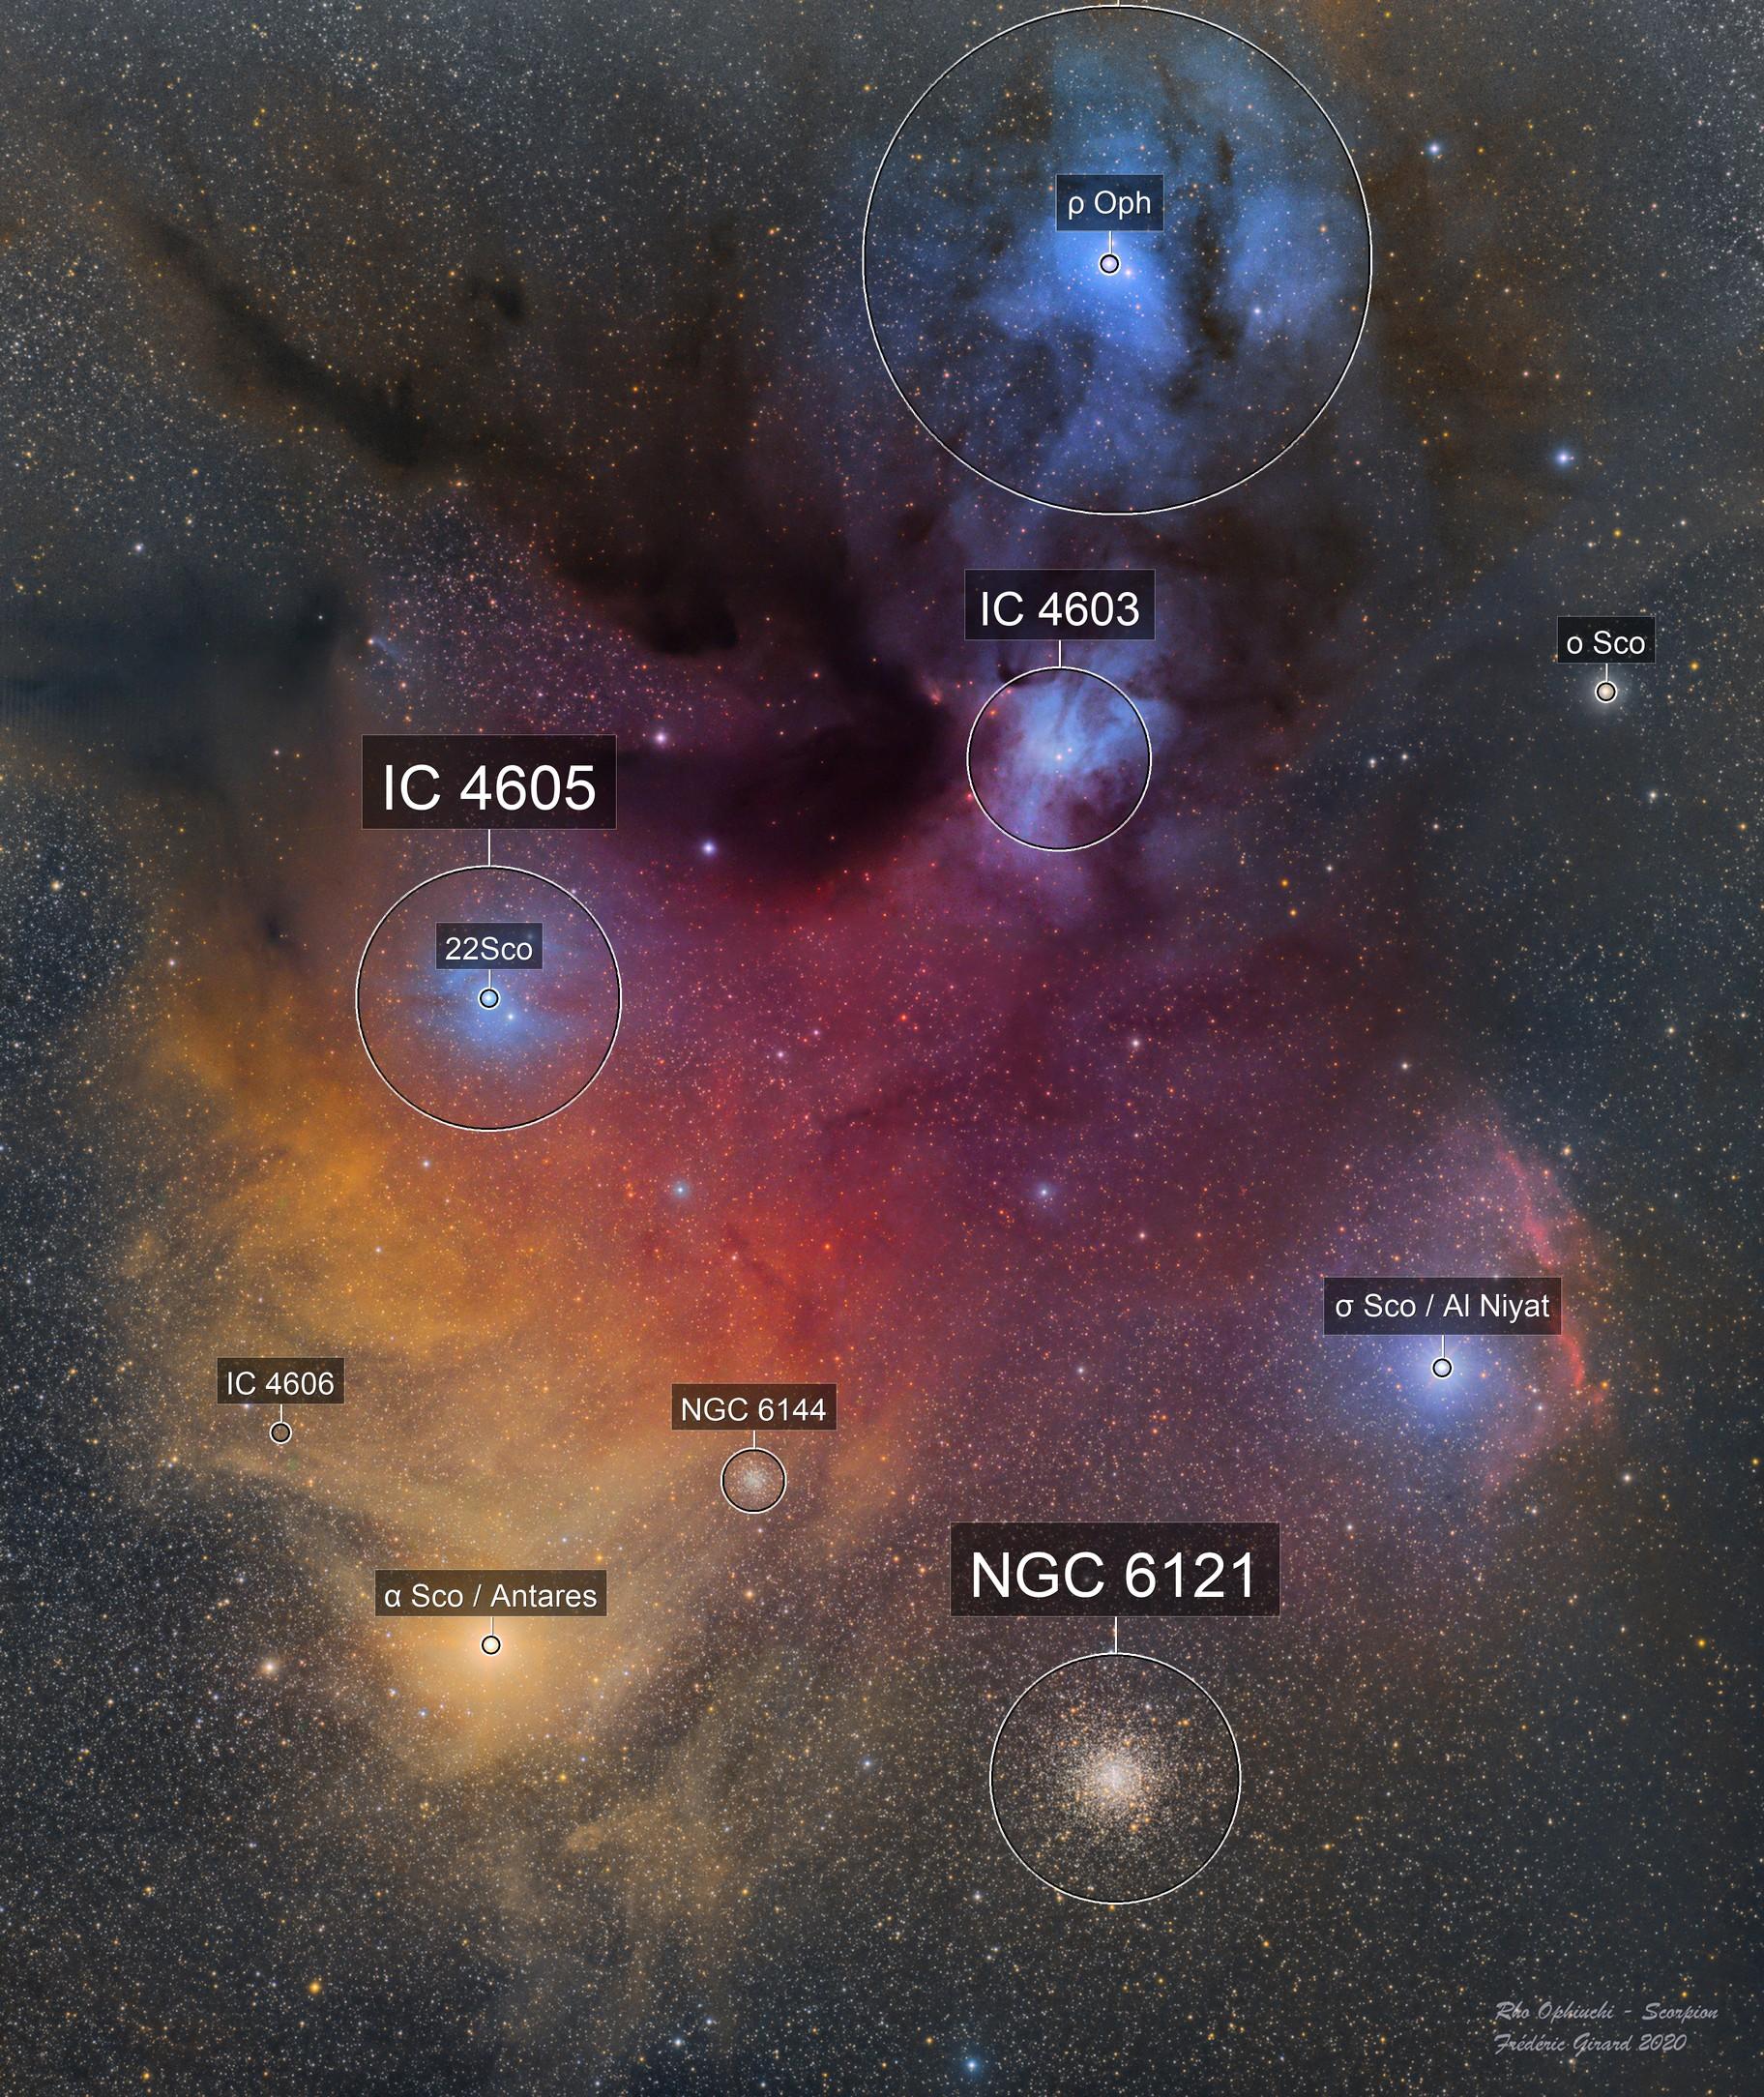 Rho Ophiuchi Nebula in Scorpion - RVB